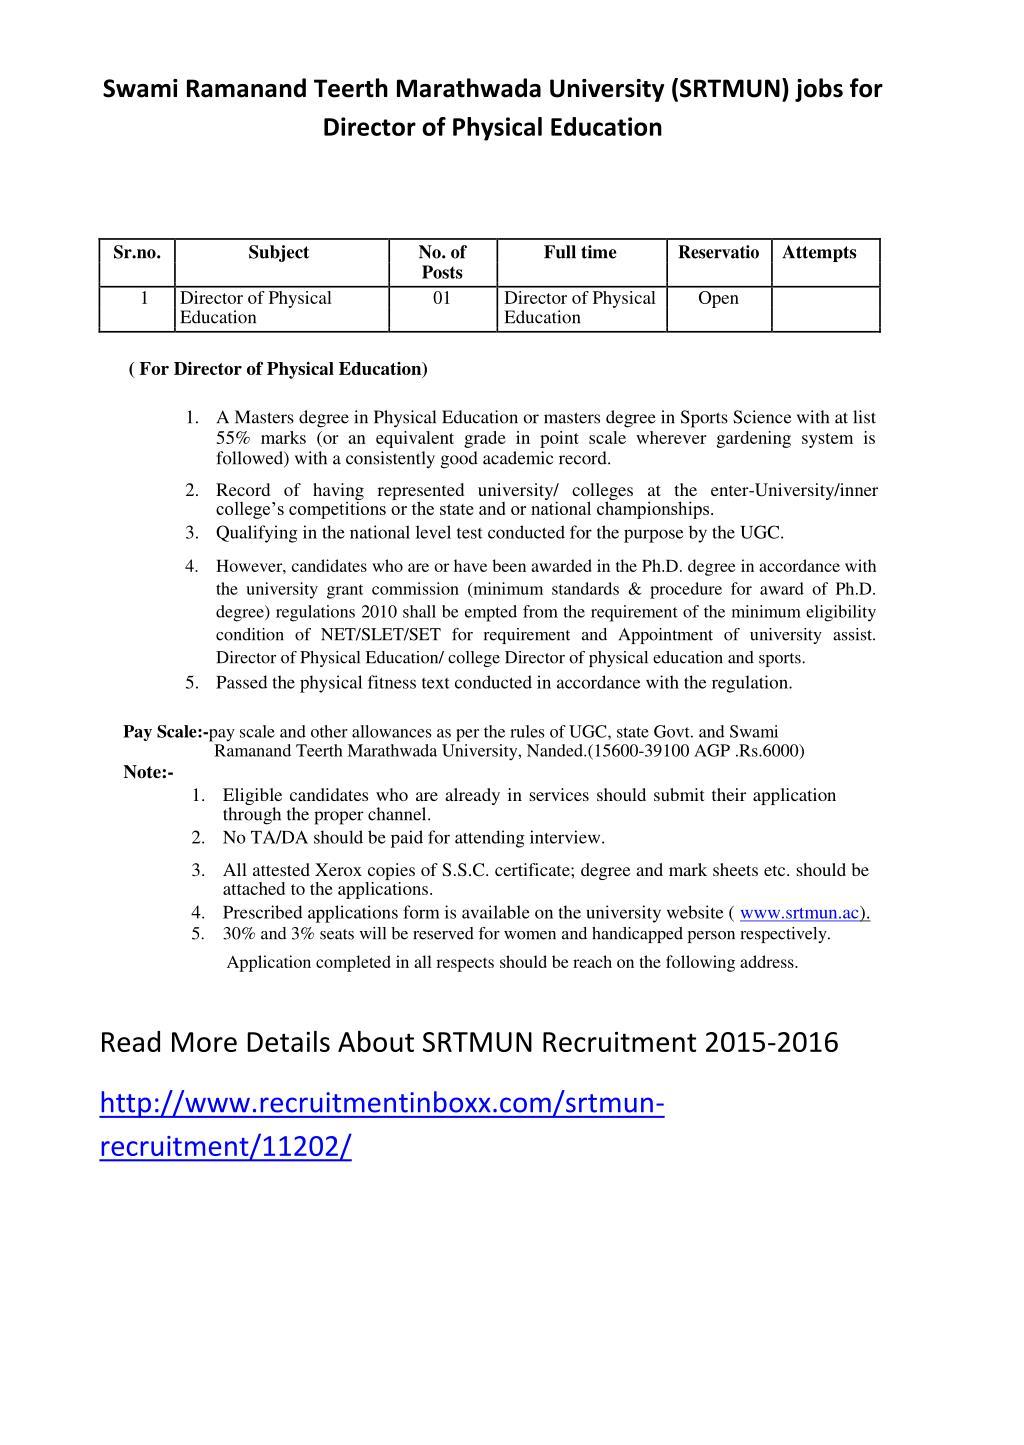 Ppt Swami Ramanand Teerth Marathwada University Srtmun Jobs For